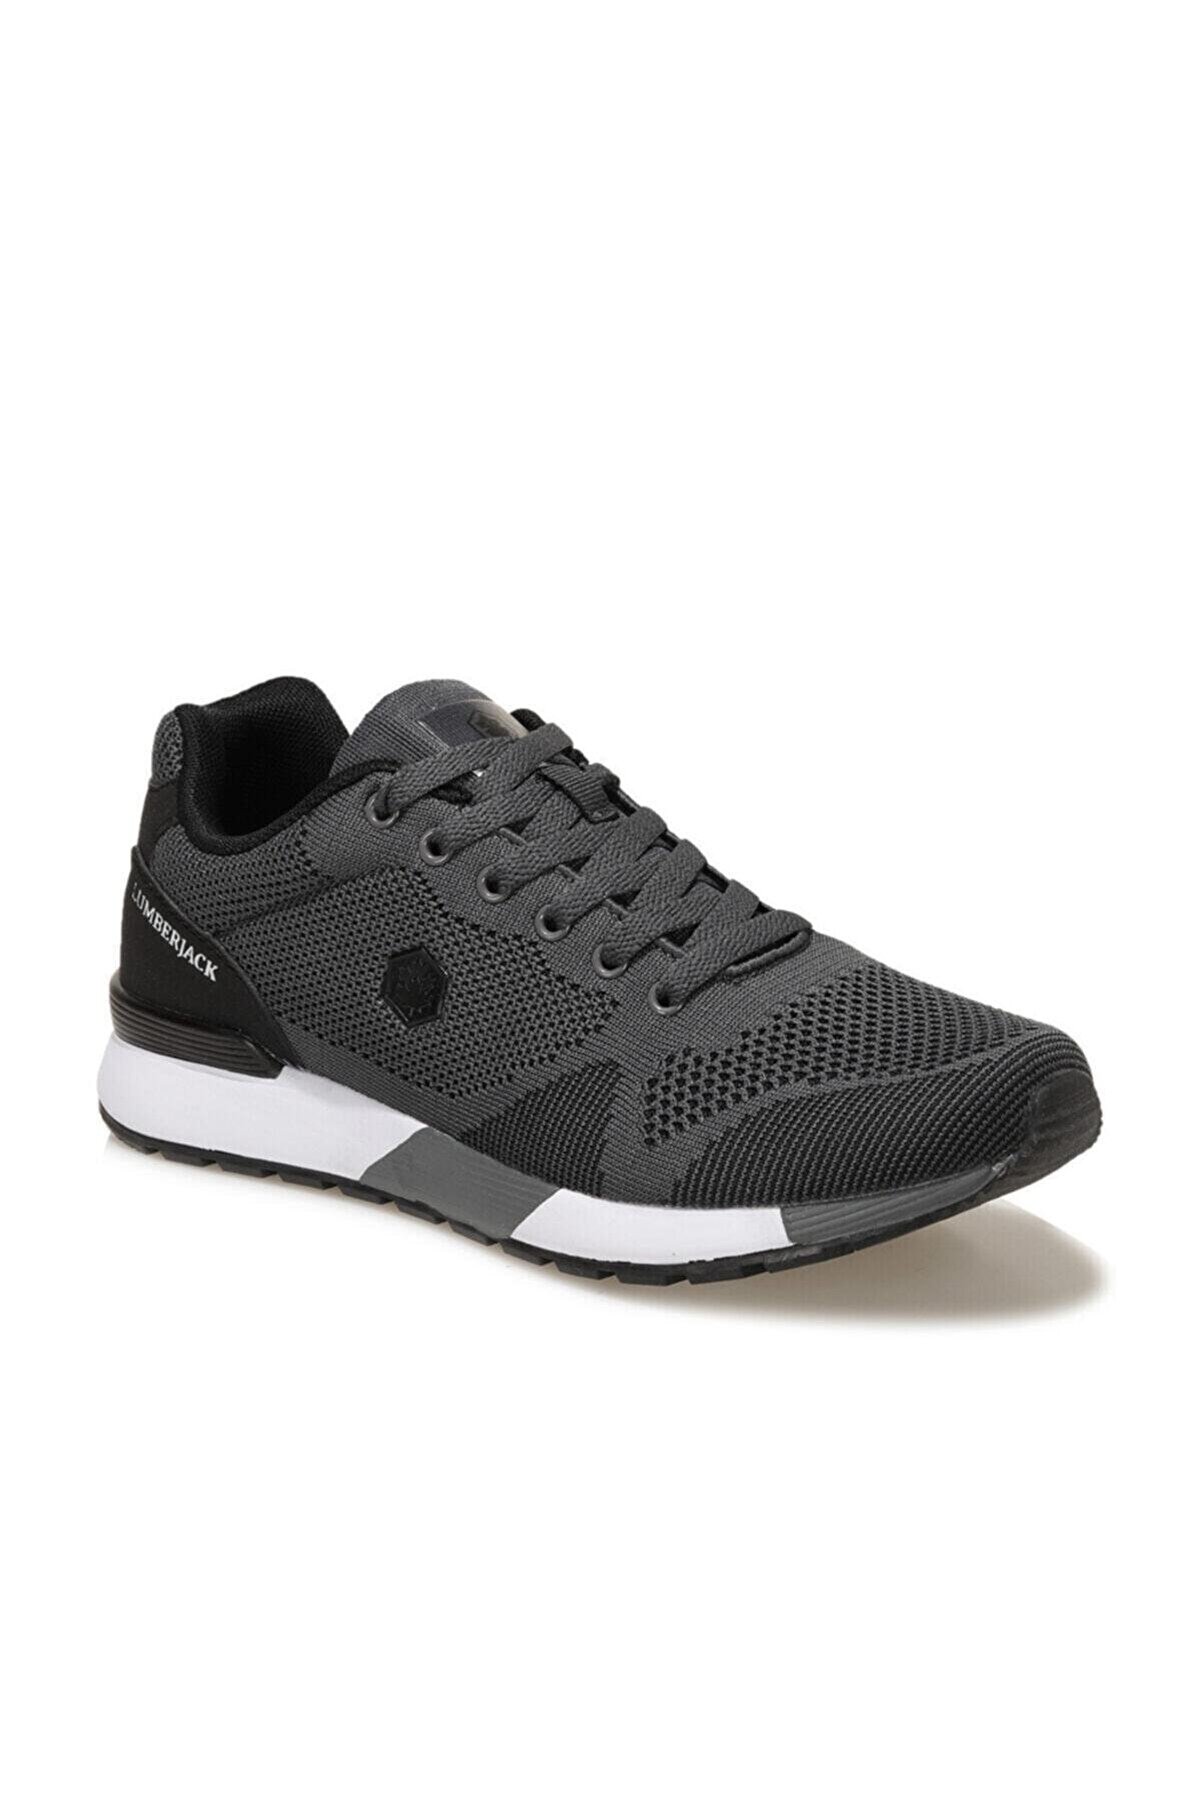 Lumberjack VENDOR 1FX Gri Erkek Sneaker Ayakkabı 100787091